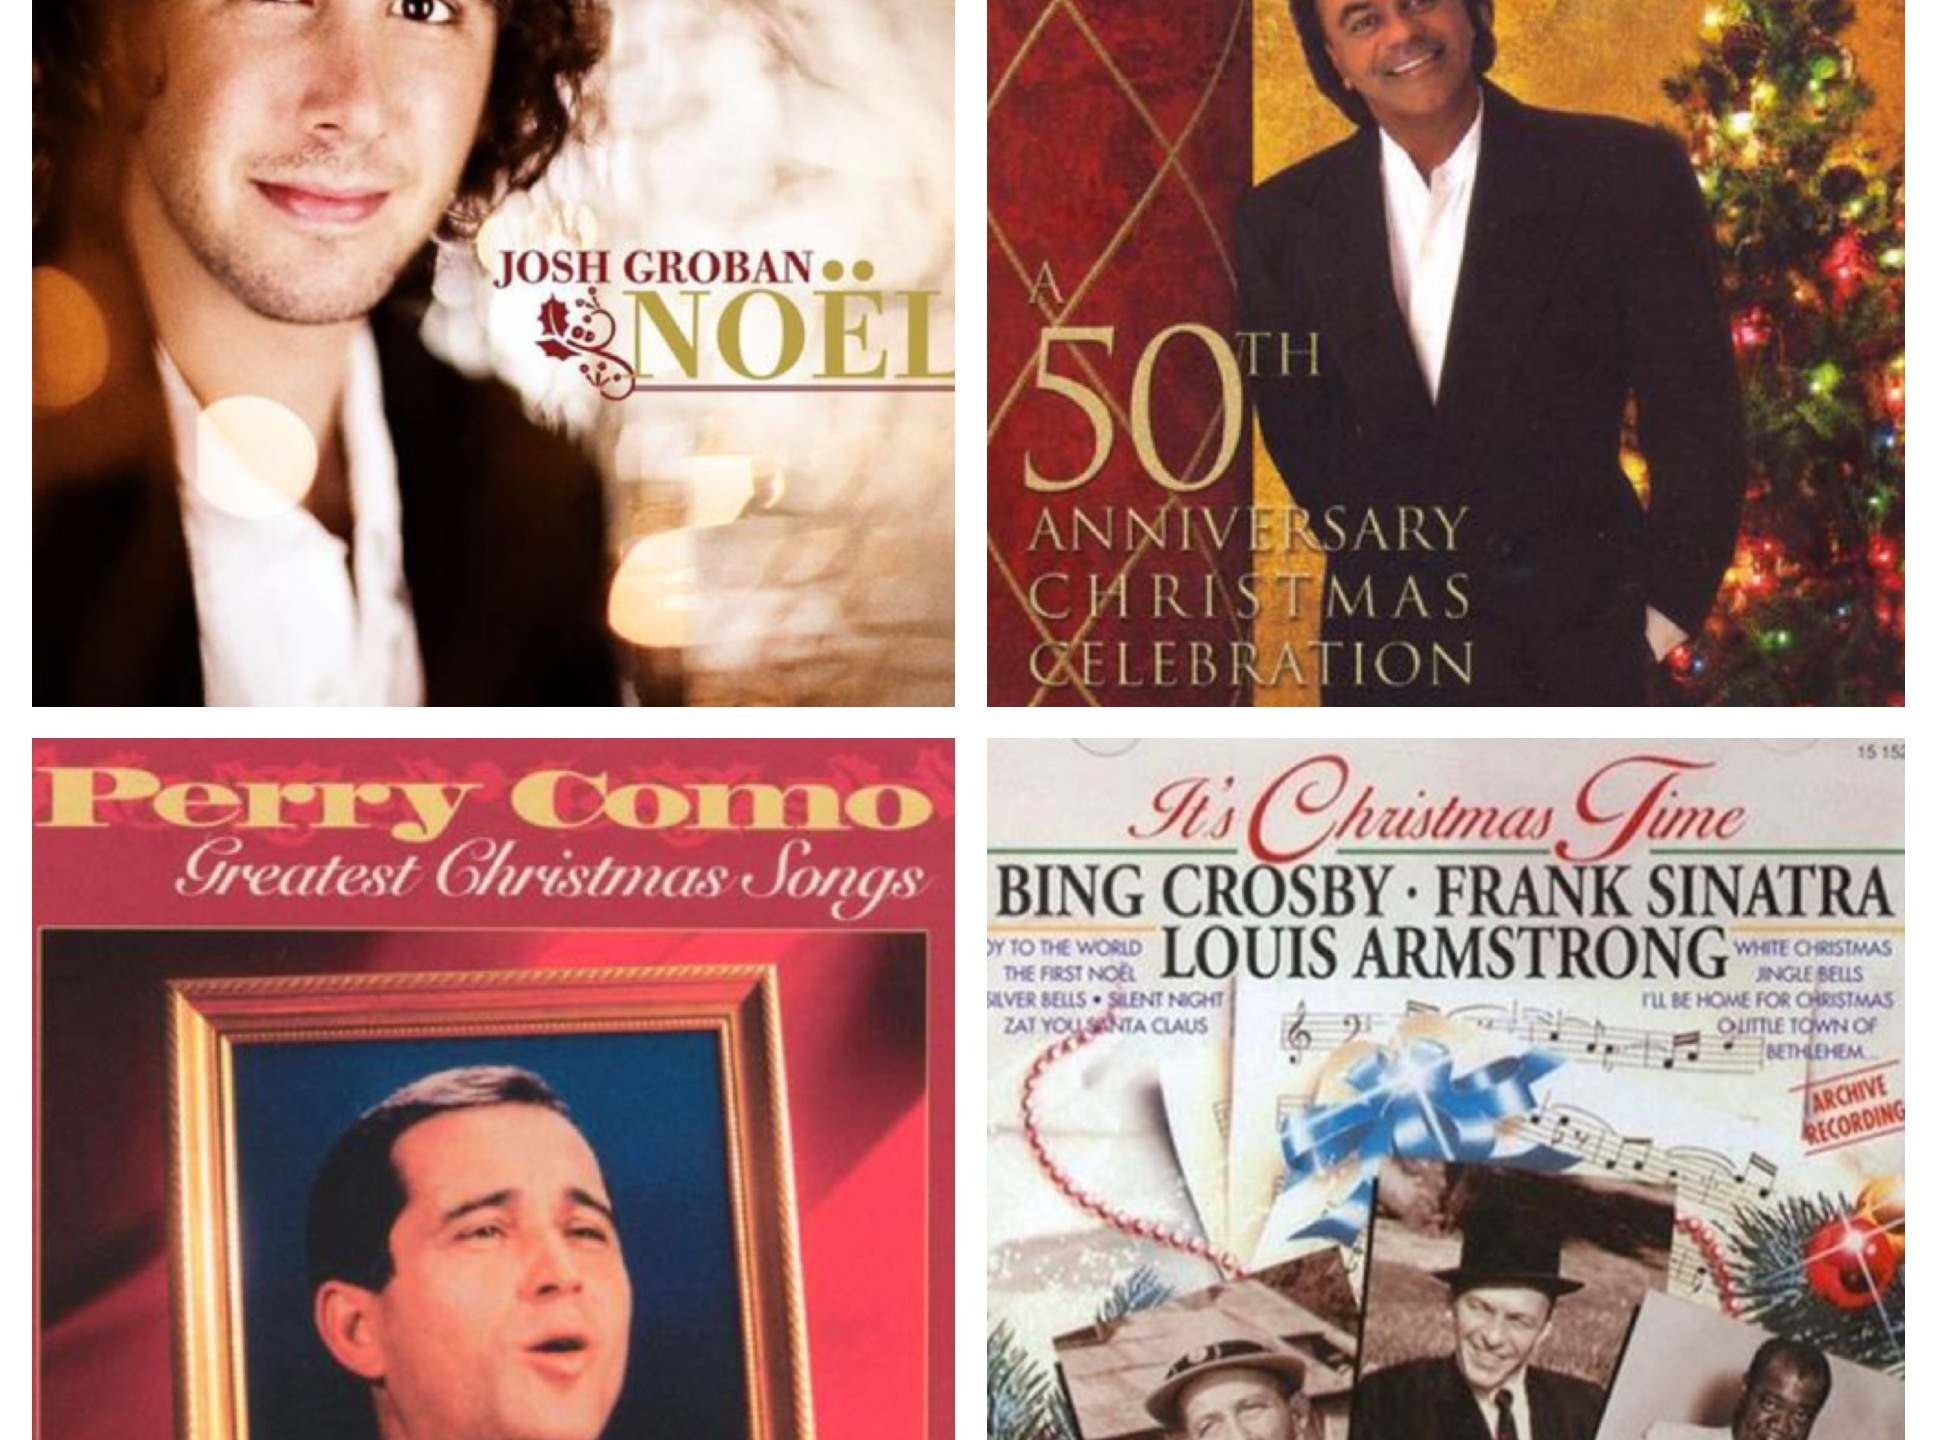 Siriusxm Christmas Music.Siriusxm Releases Christmas Music Schedule Stations